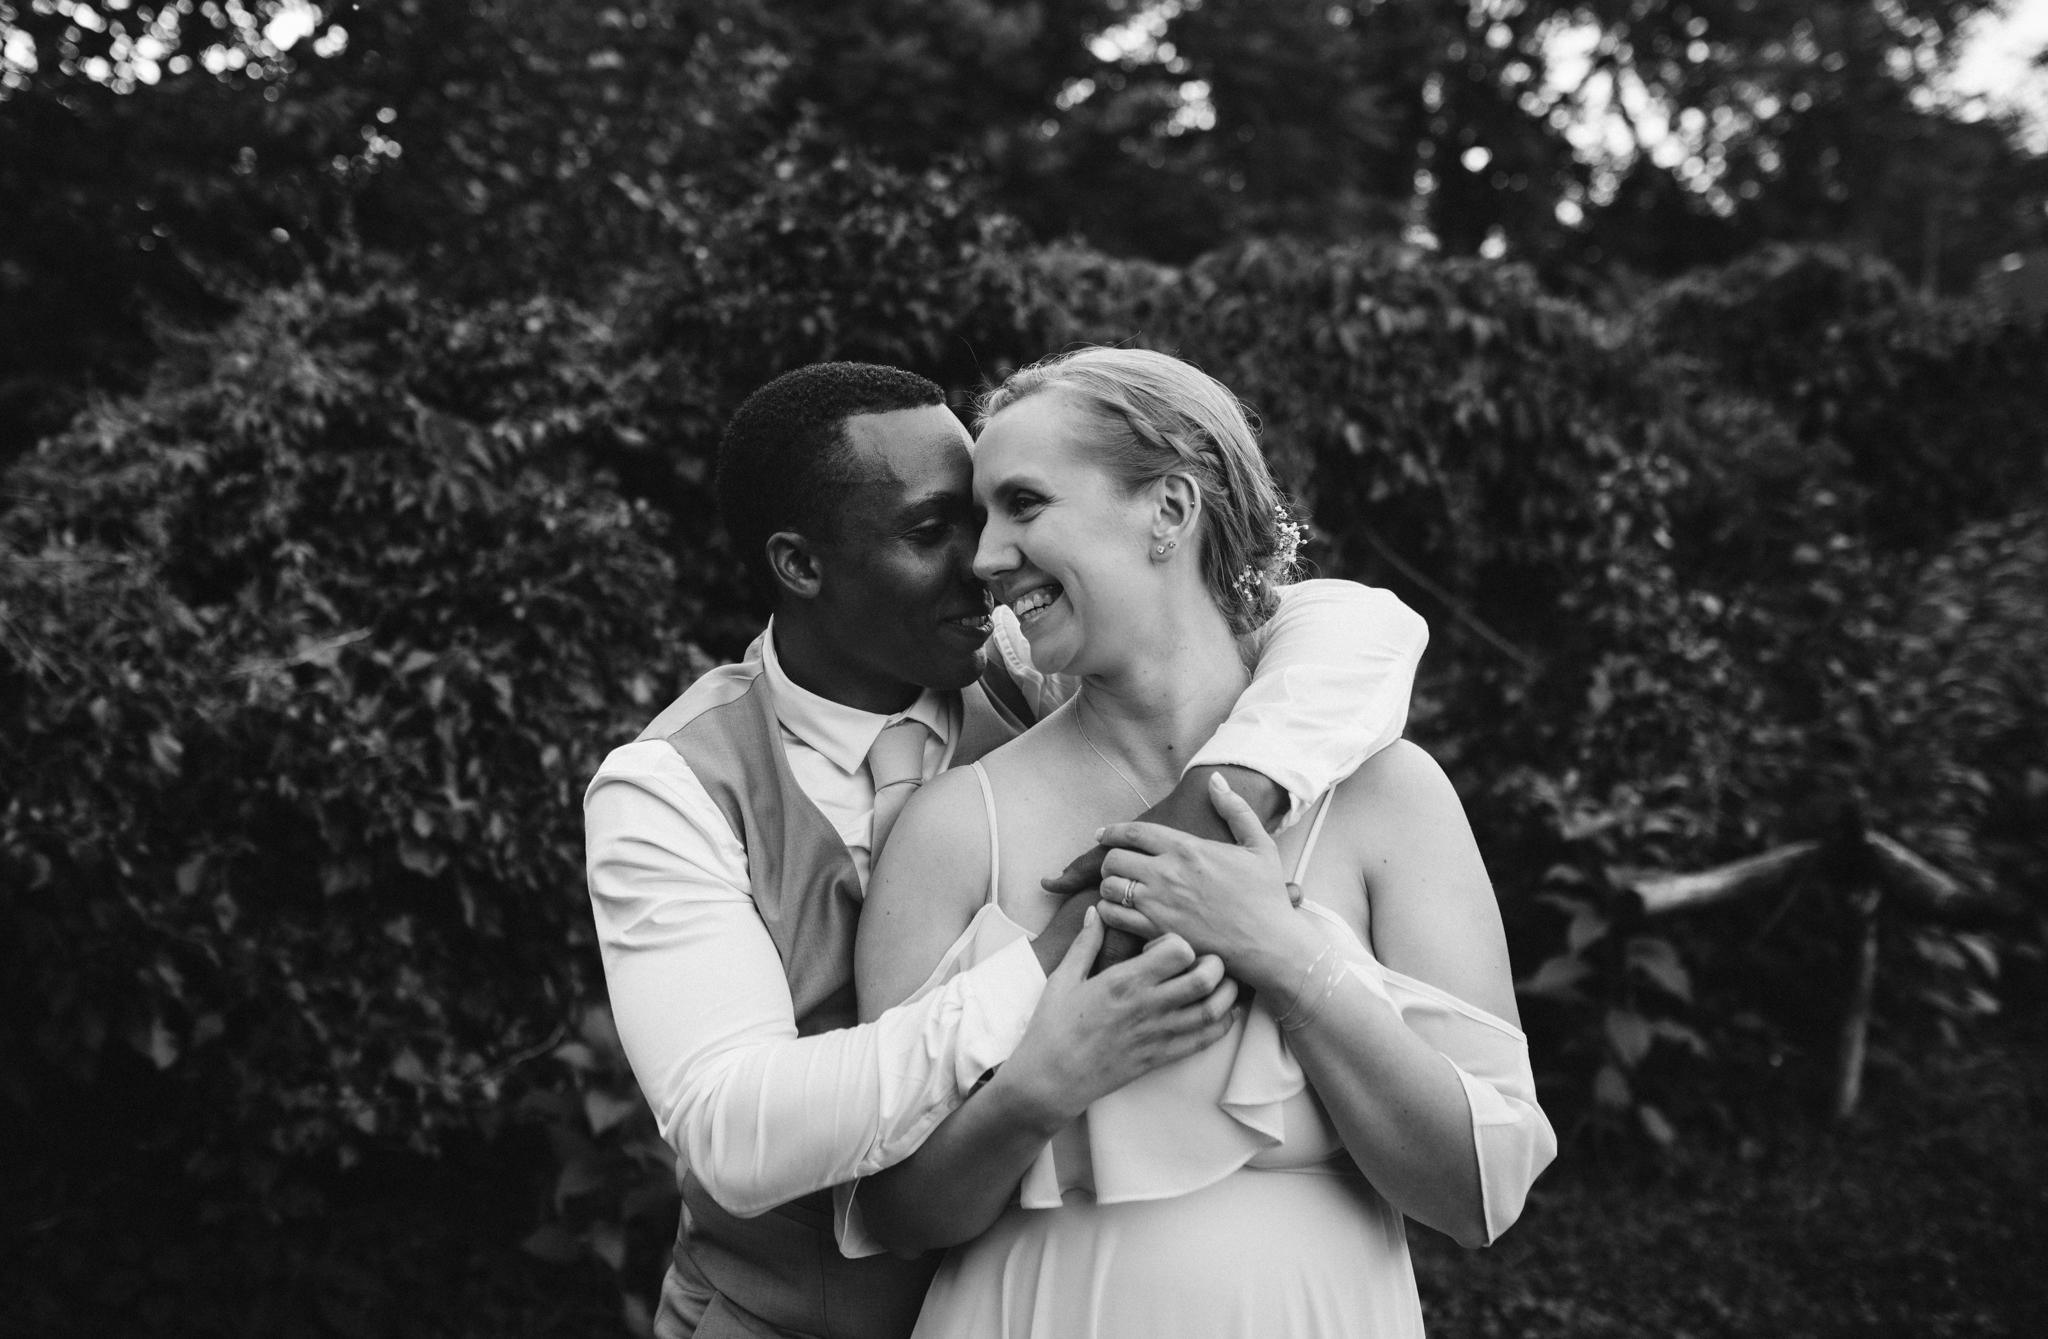 dorota_dwight_richmond_backyard_wedding-86.jpg